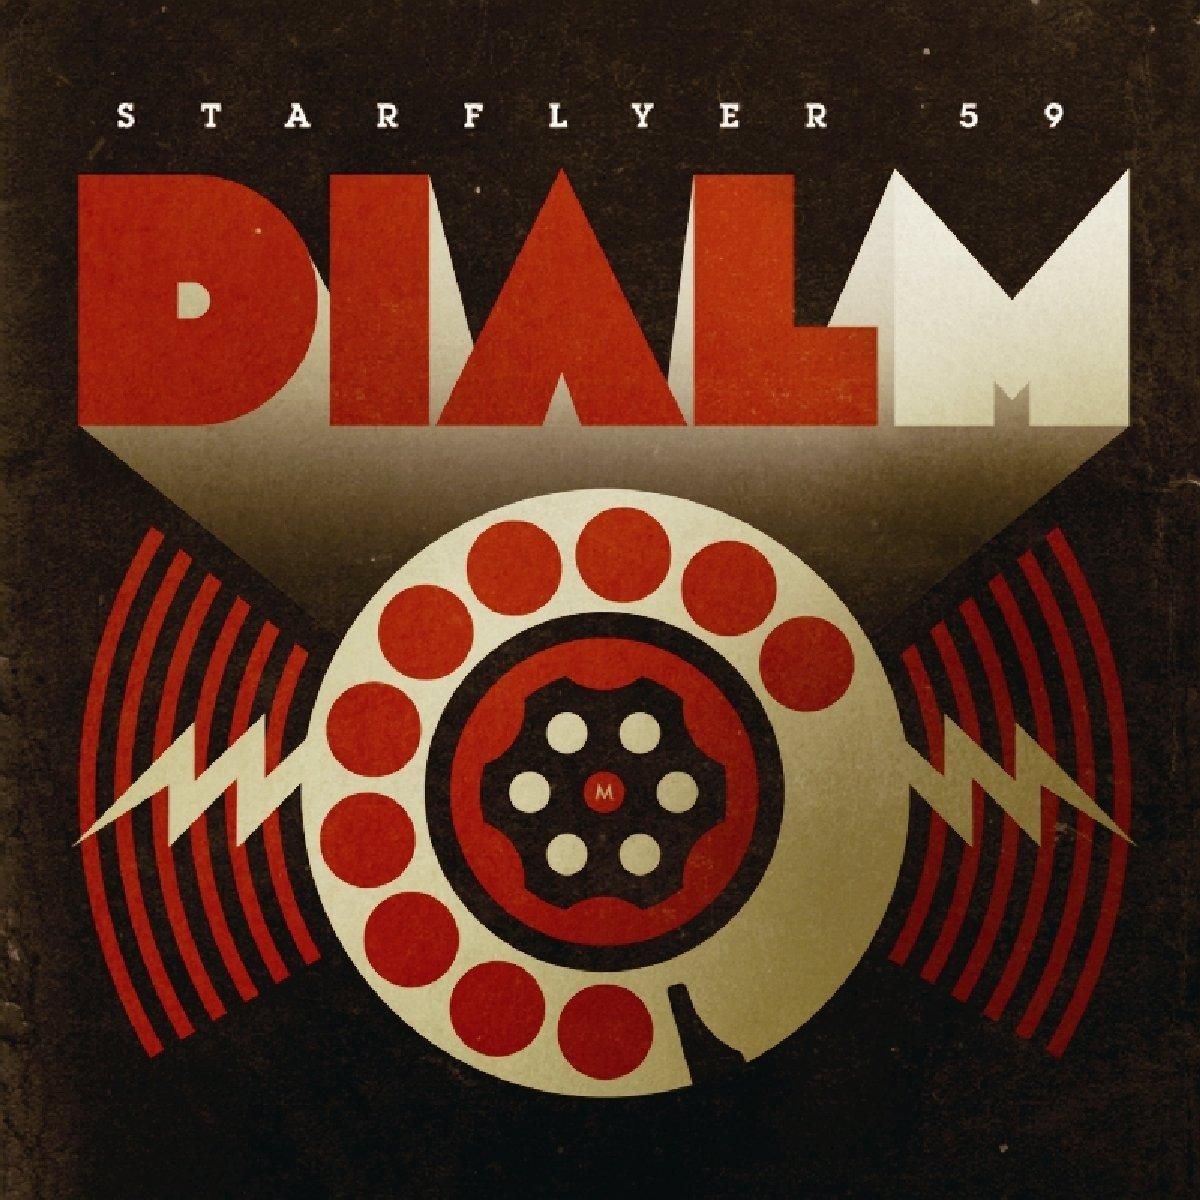 Dial M [Vinyl]